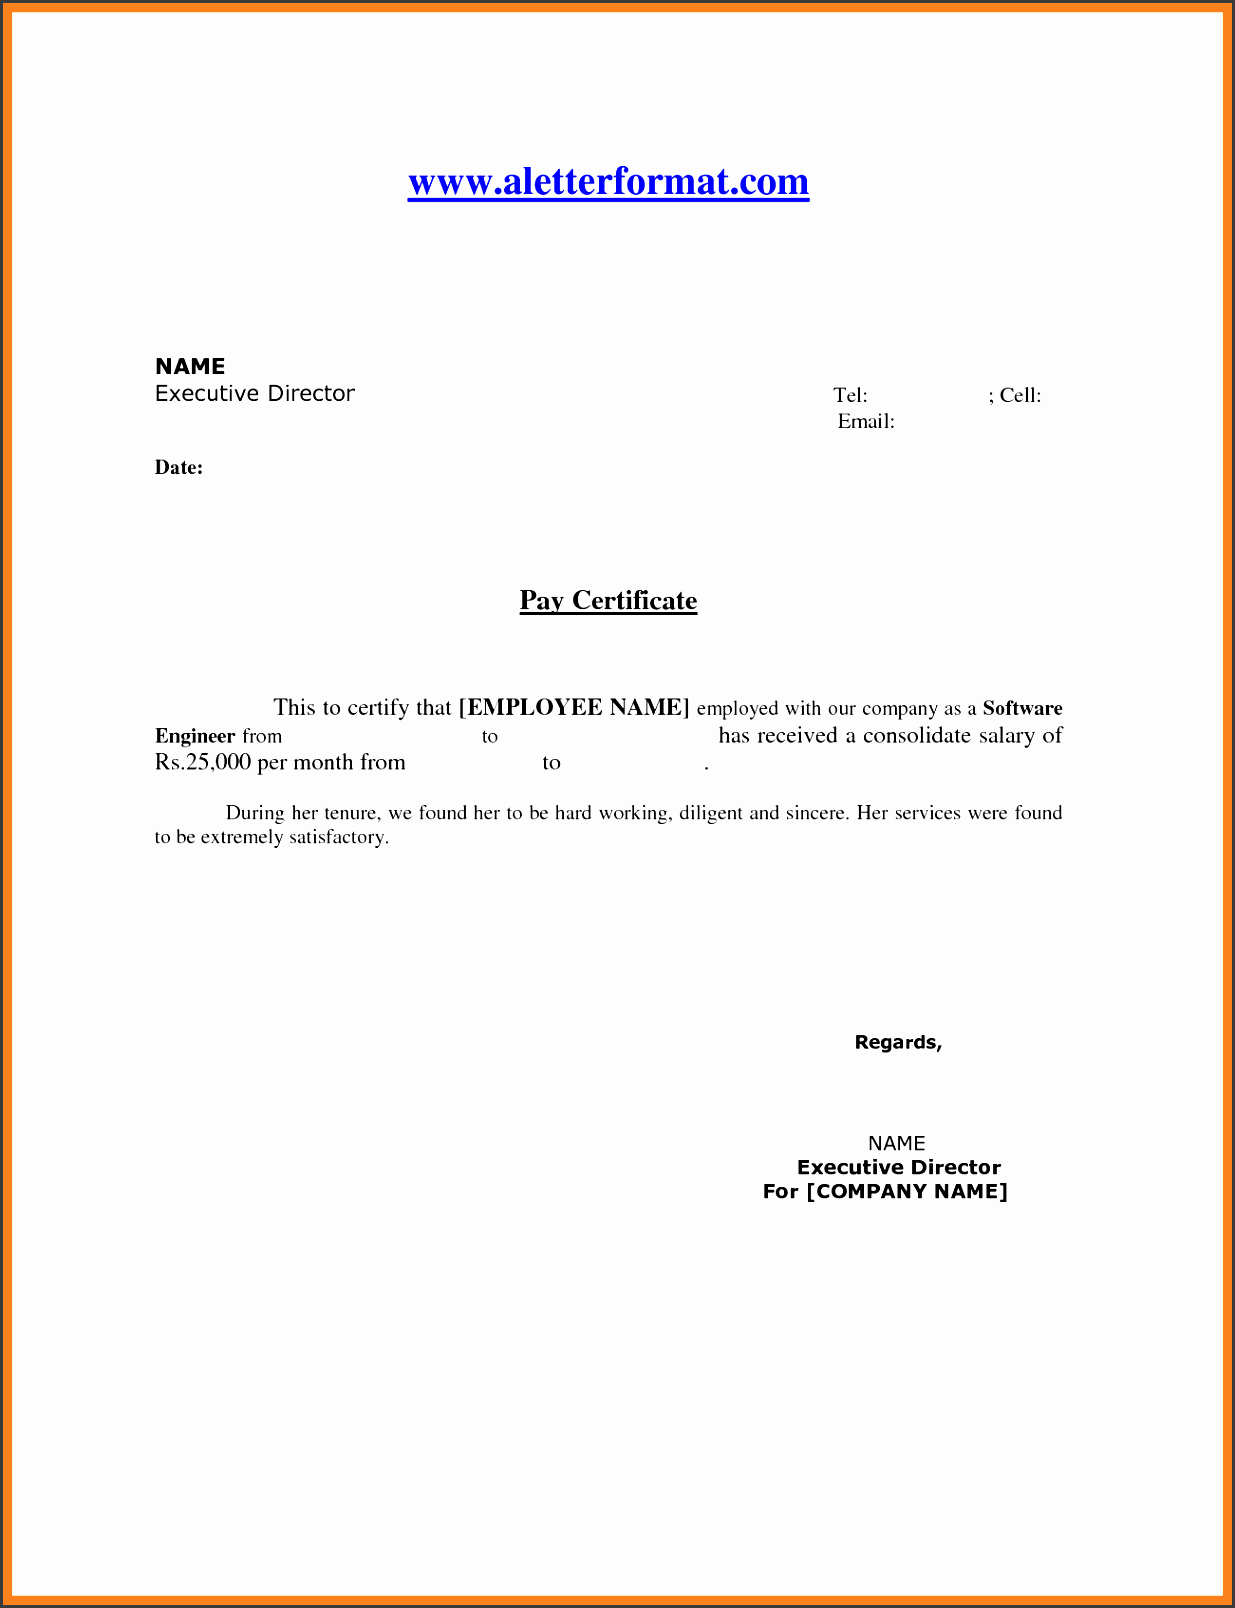 5 salary statement template